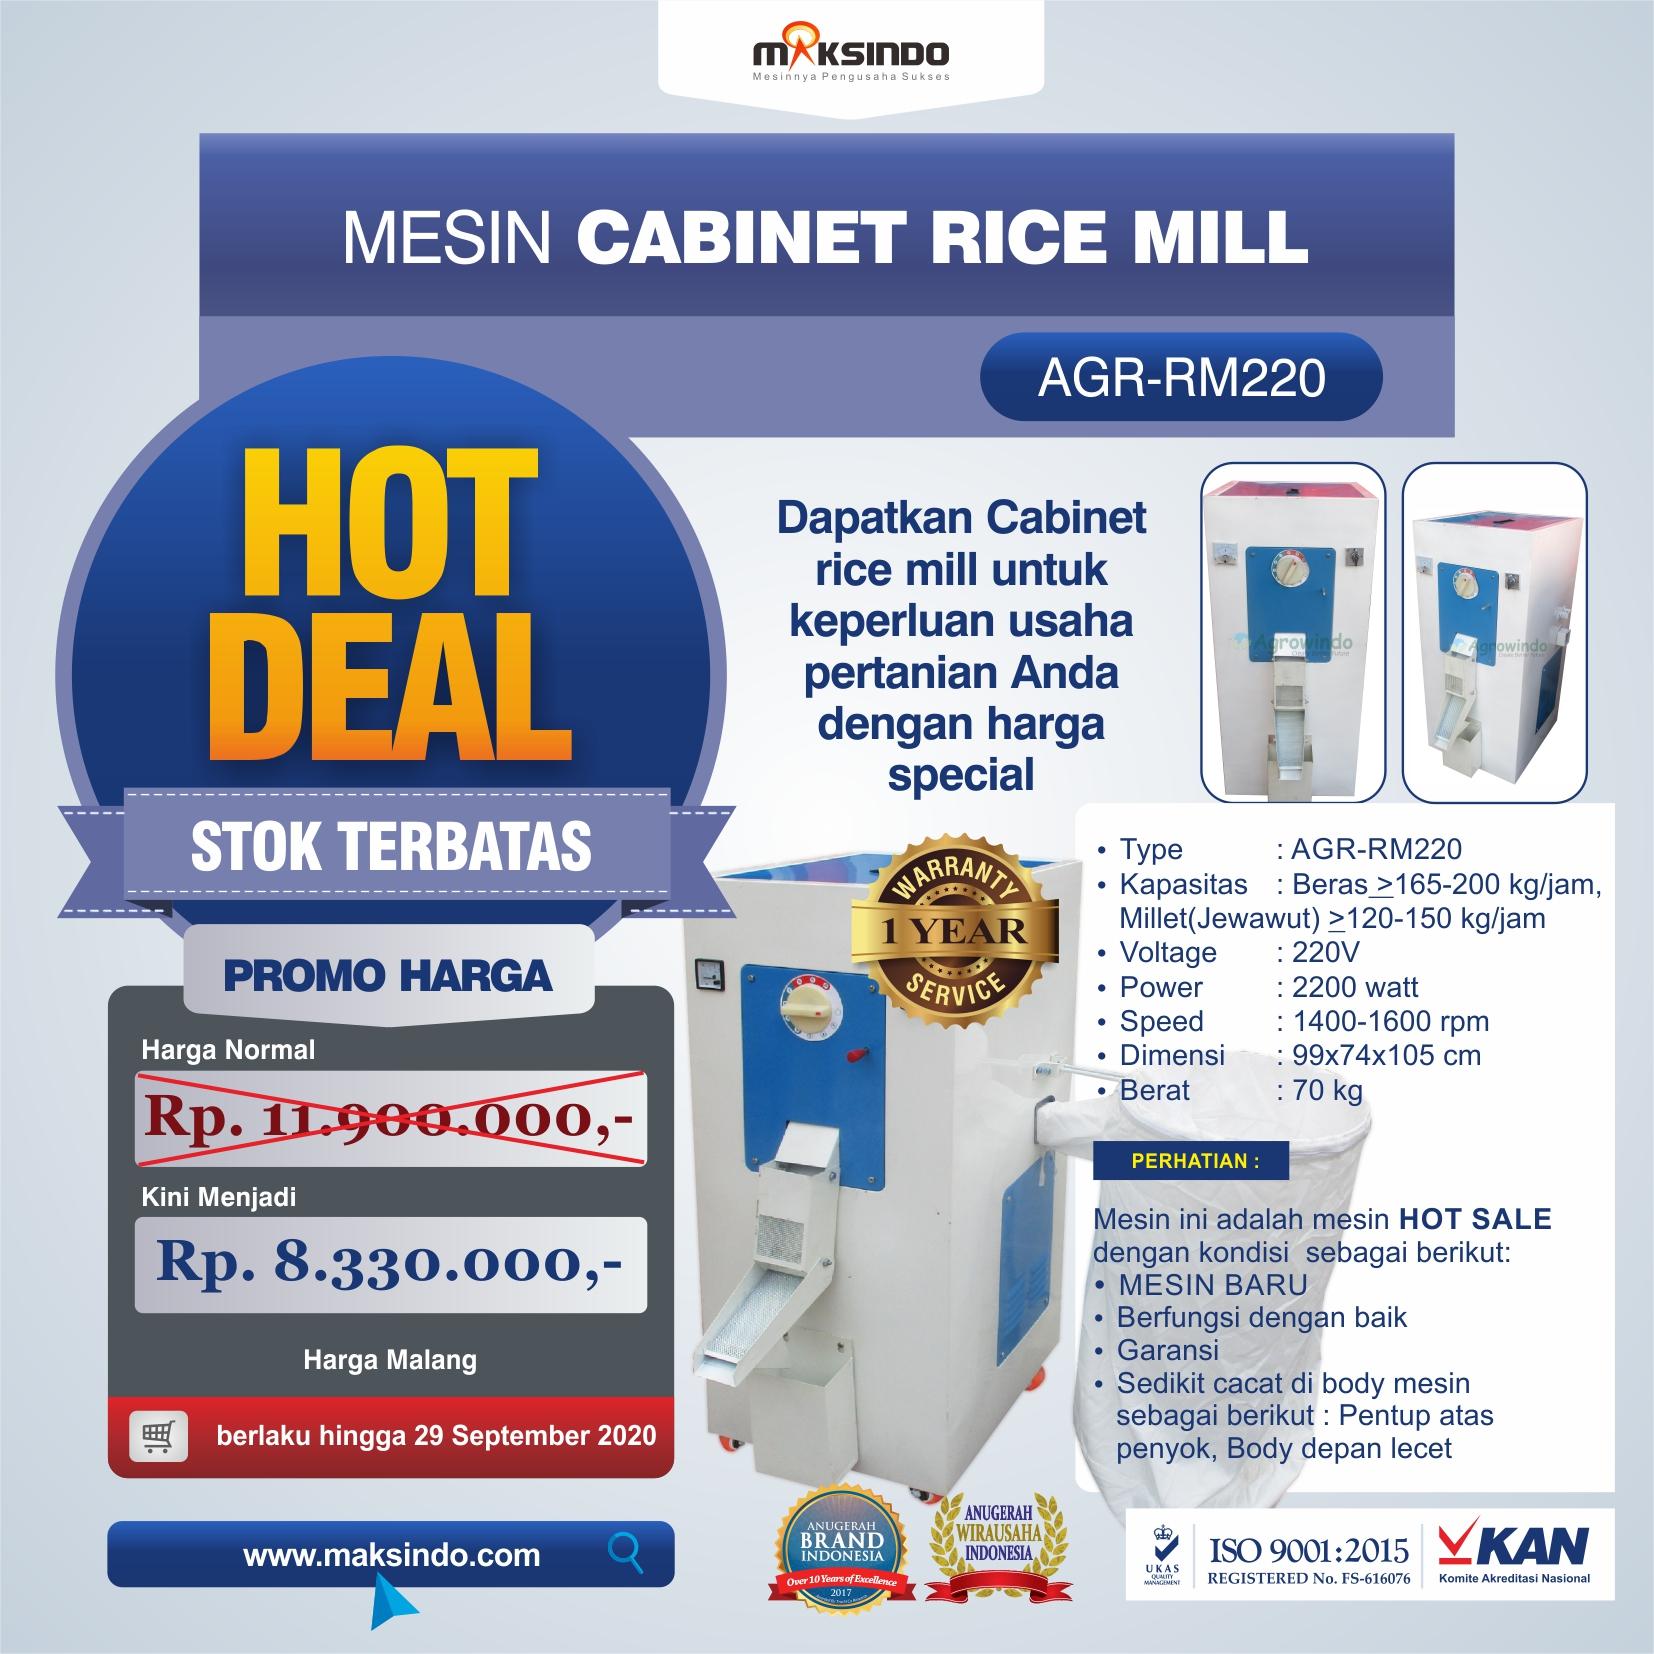 Jual Mesin Cabinet Rice Mill AGR-RM220 di Jakarta